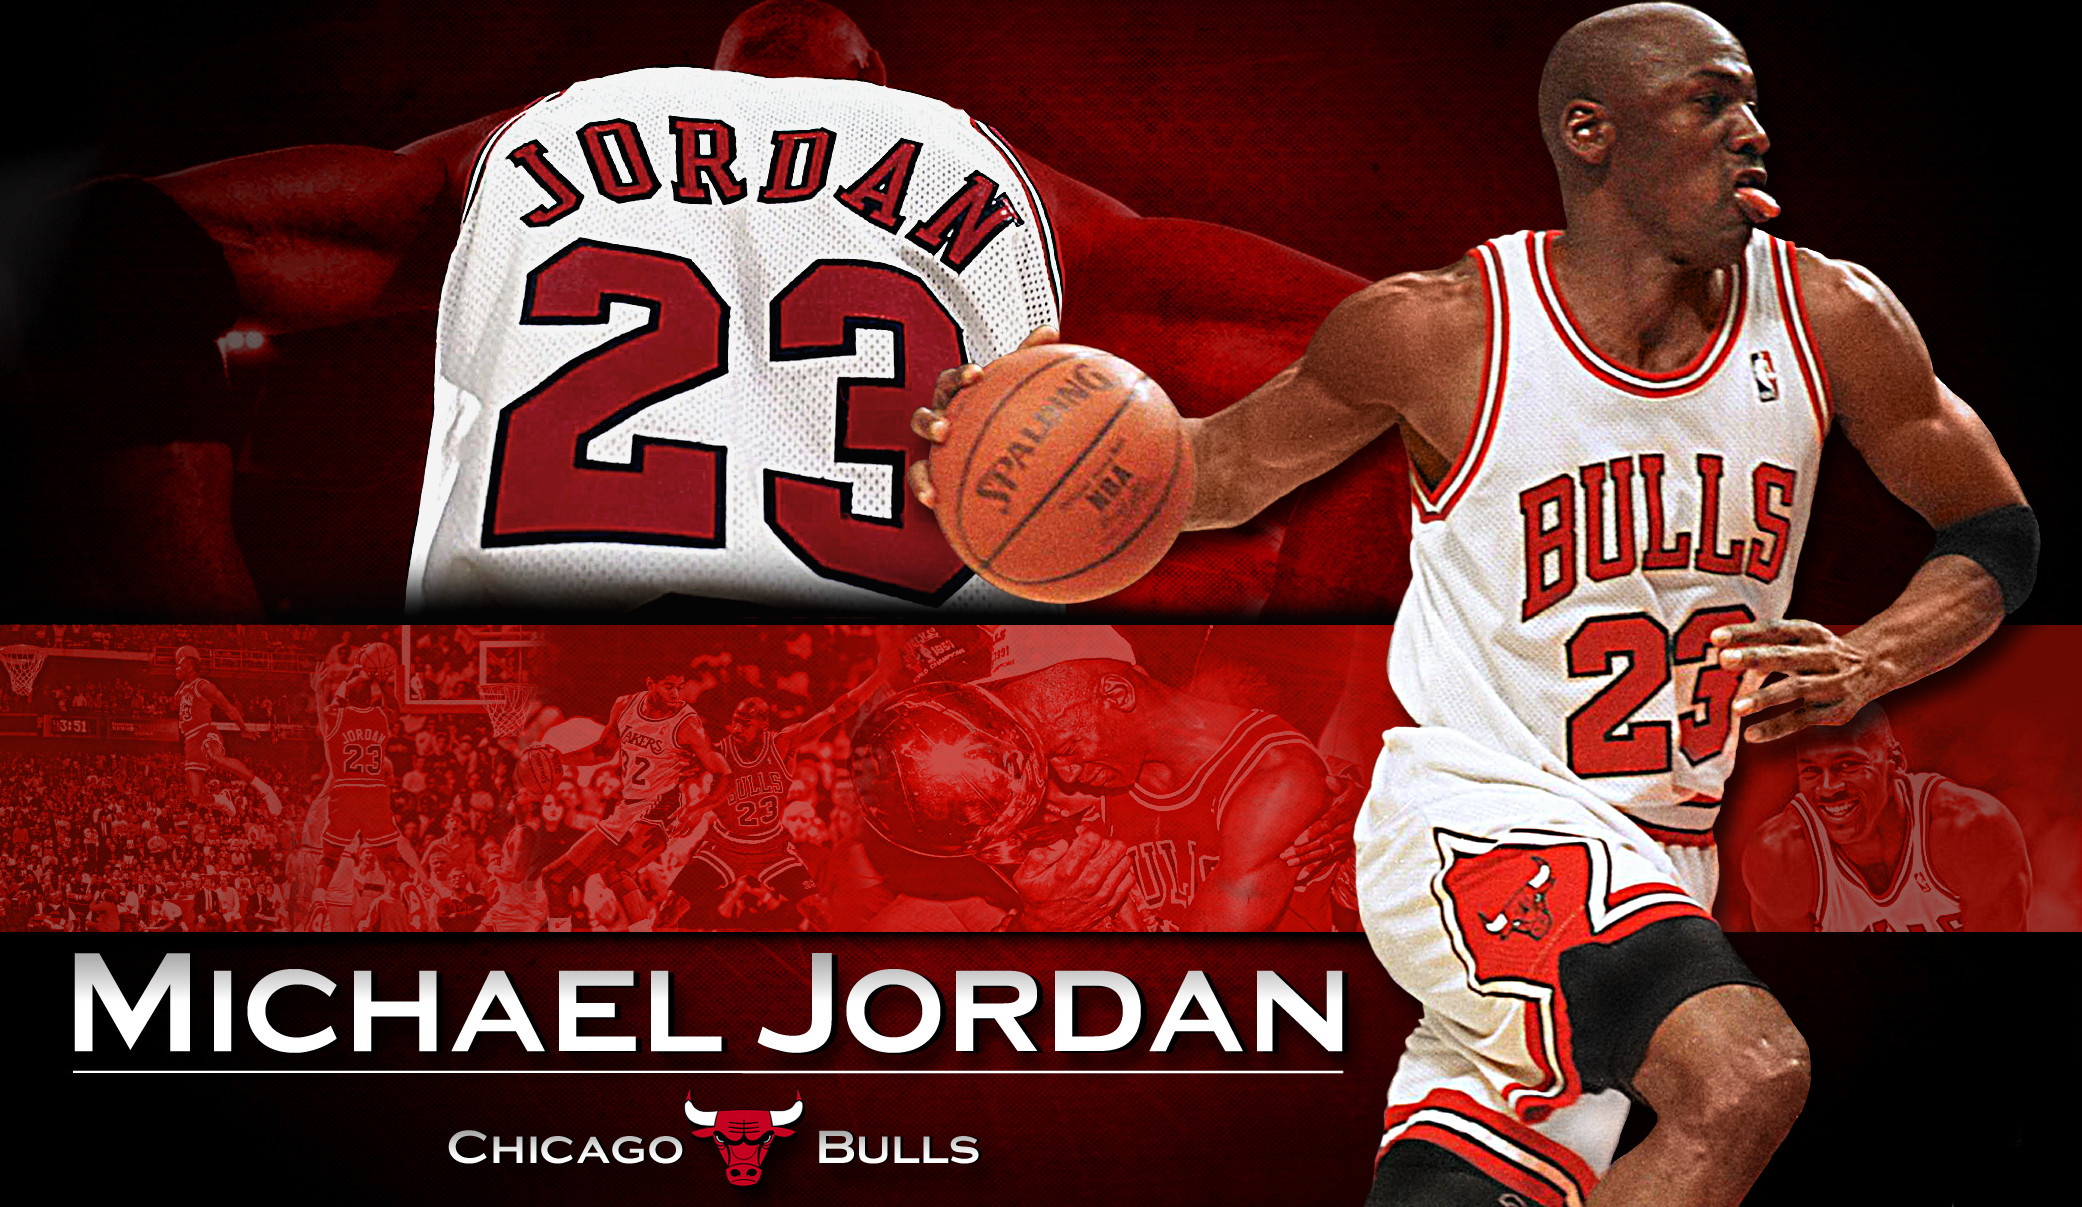 Michael Jordan Chicago Bulls Backgrounds.